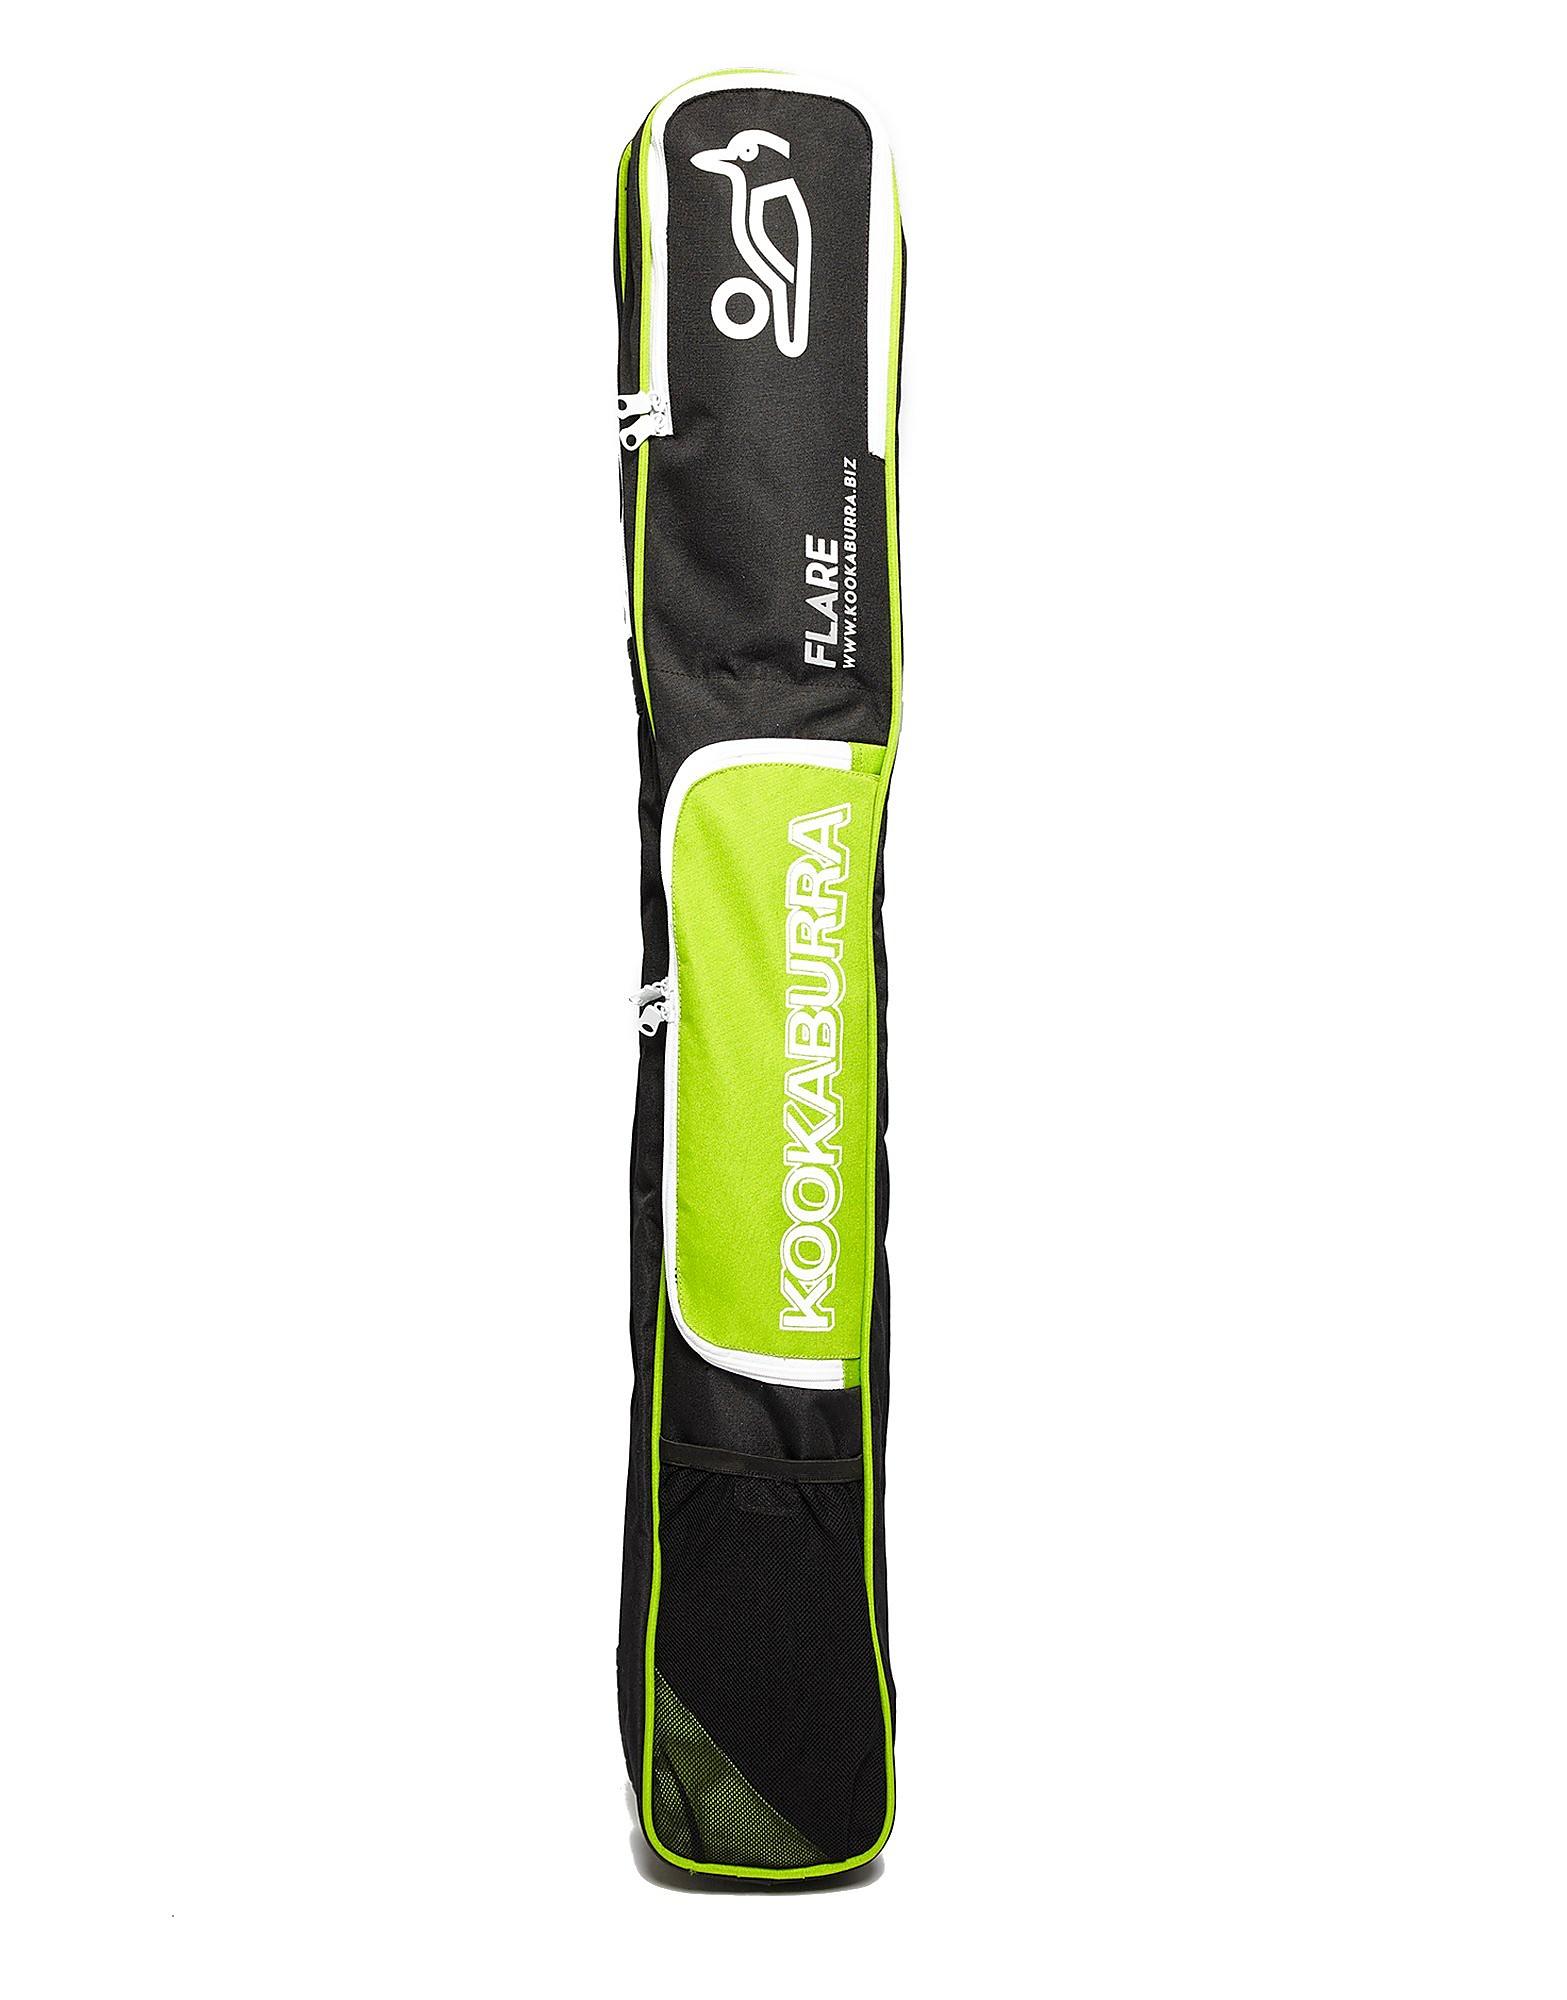 Kookaburra Flare Hockey Stick Bag